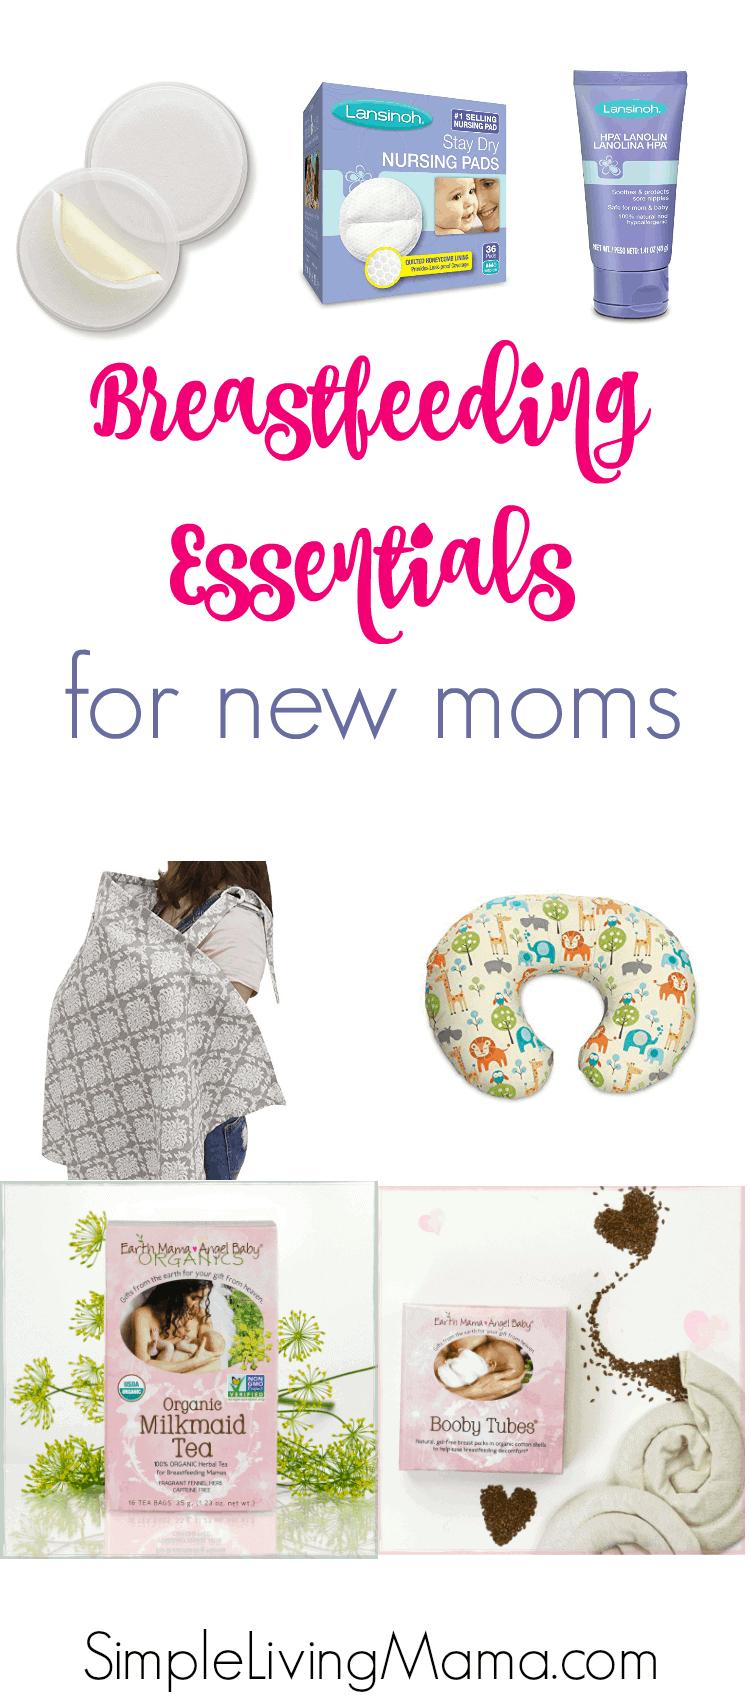 Breastfeeding Essentials for New Moms